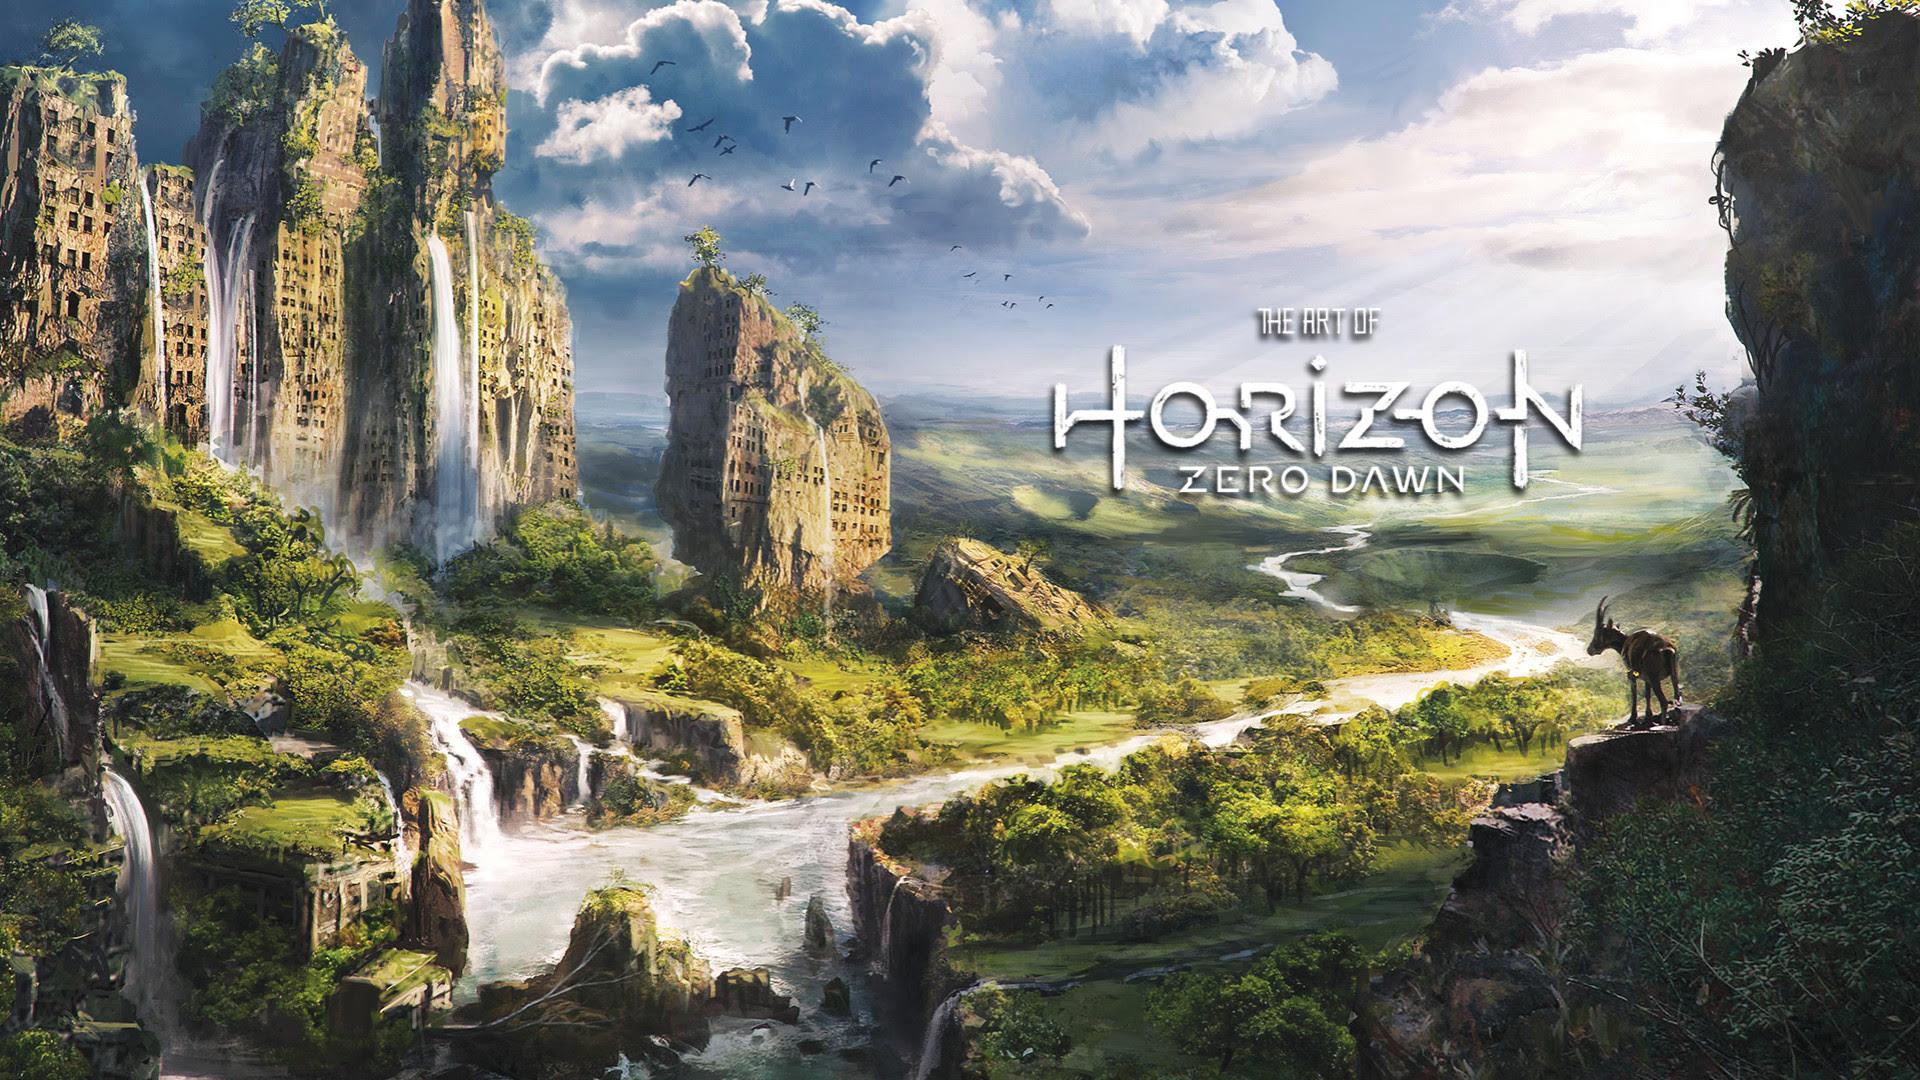 Horizon Zero Dawn Wallpaper 4k Pixar Wallpapers